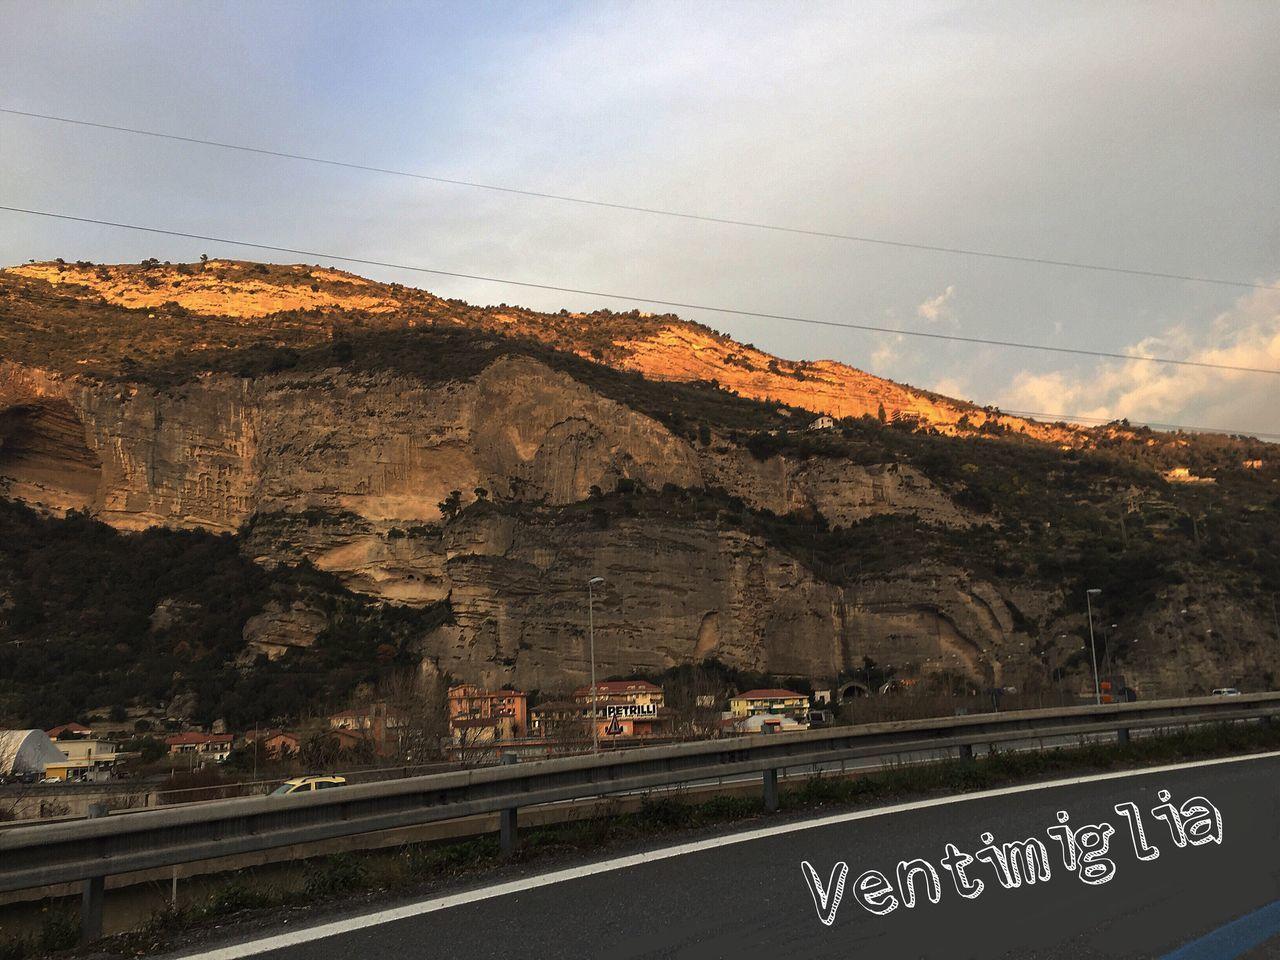 Mountain Ventimiglia Vintimille Montagne